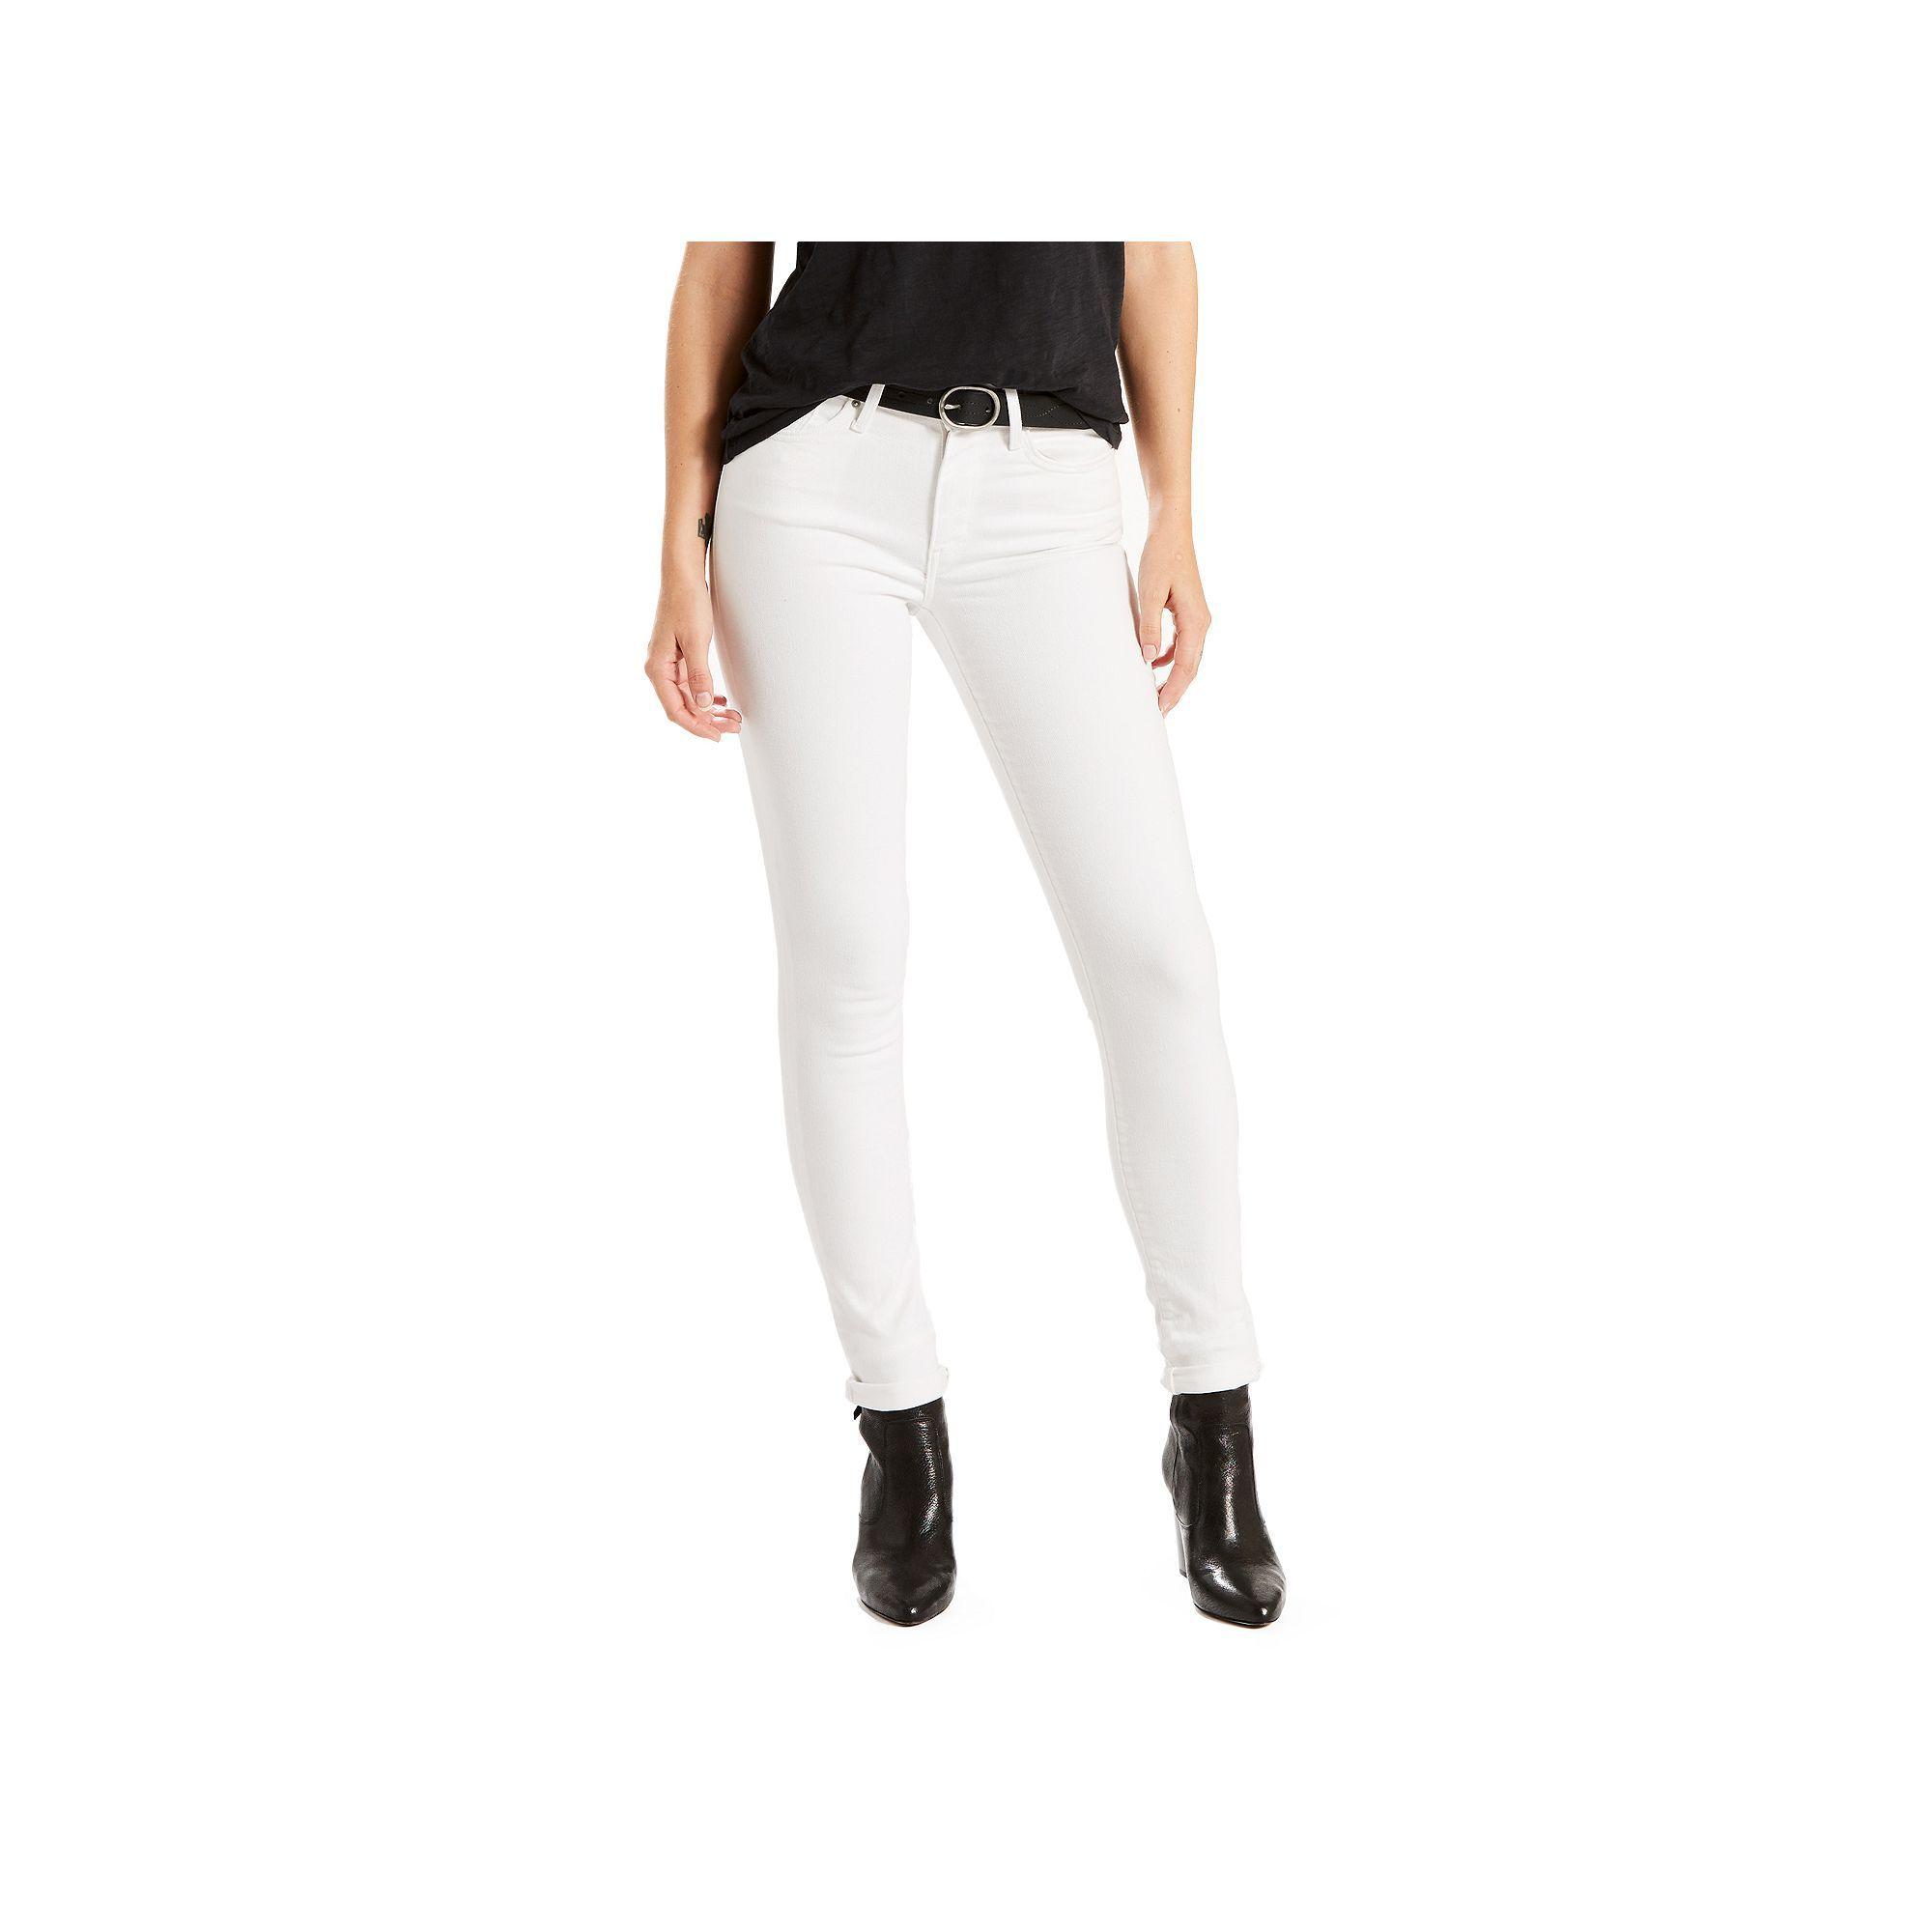 a57ec1ee651 Levi s Levis Women s Slimming Skinny Jeans